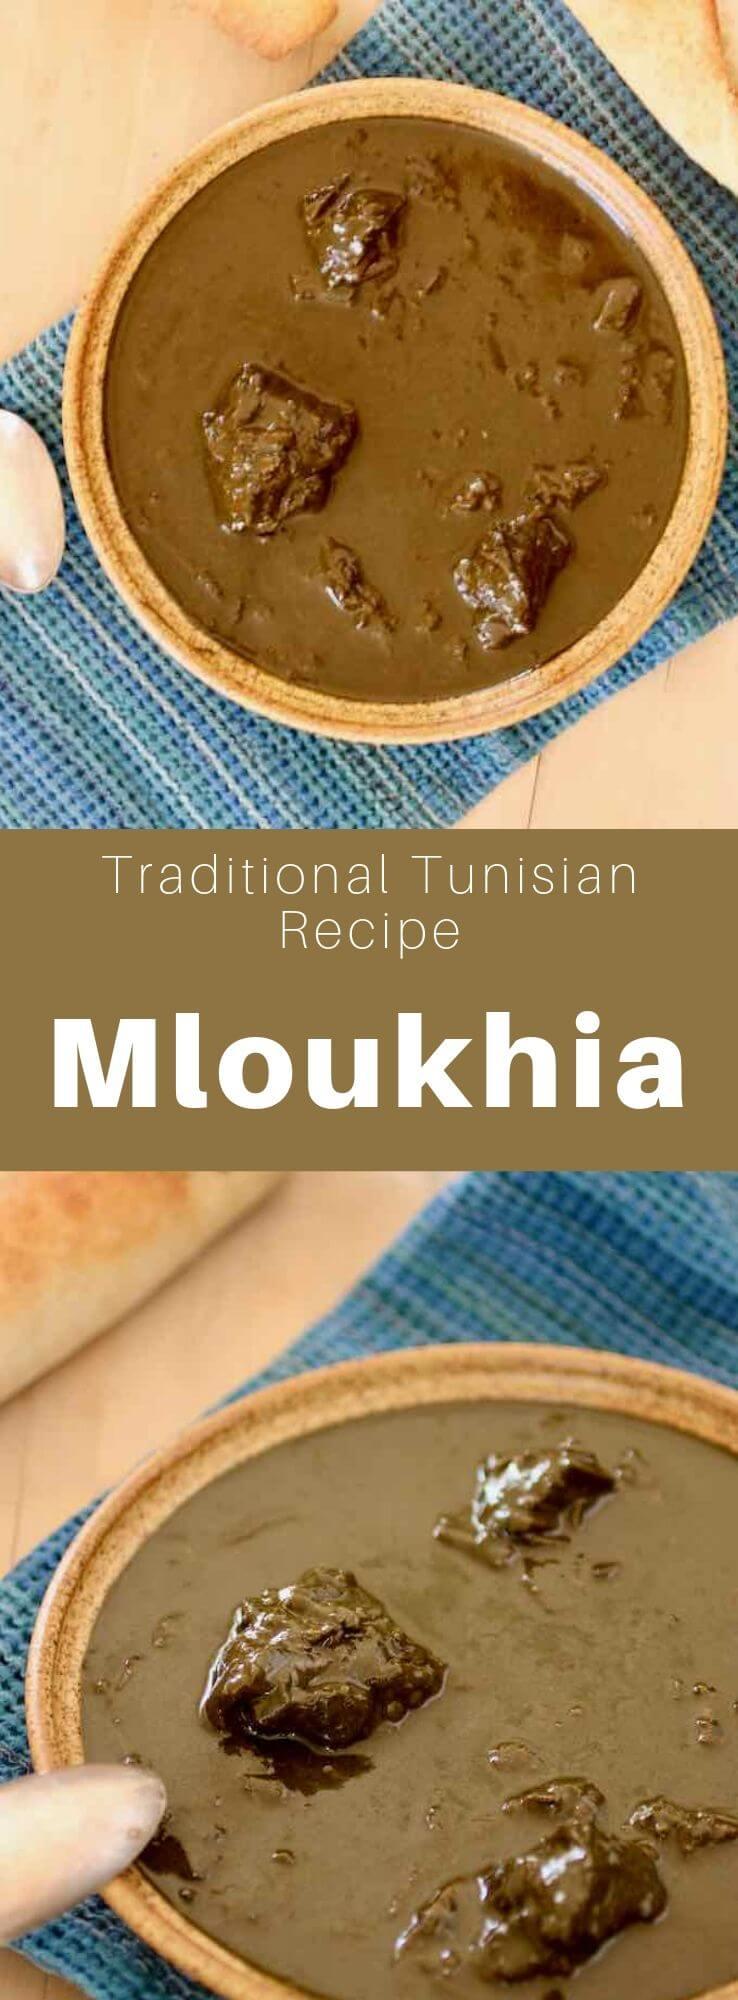 Mloukhia is a traditional Tunisian stew prepared with dried Jew's mallow and beef, which is usually eaten with Tunisian Italian bread. #Tunisia #Tunisian #TunisianCuisine #TunisianRecipe #NorthAfricanCuisine #NorthAfricanRecipe #NorthAfrica #Maghreb #MaghrebCuisine #WorldCuisine #196flavors